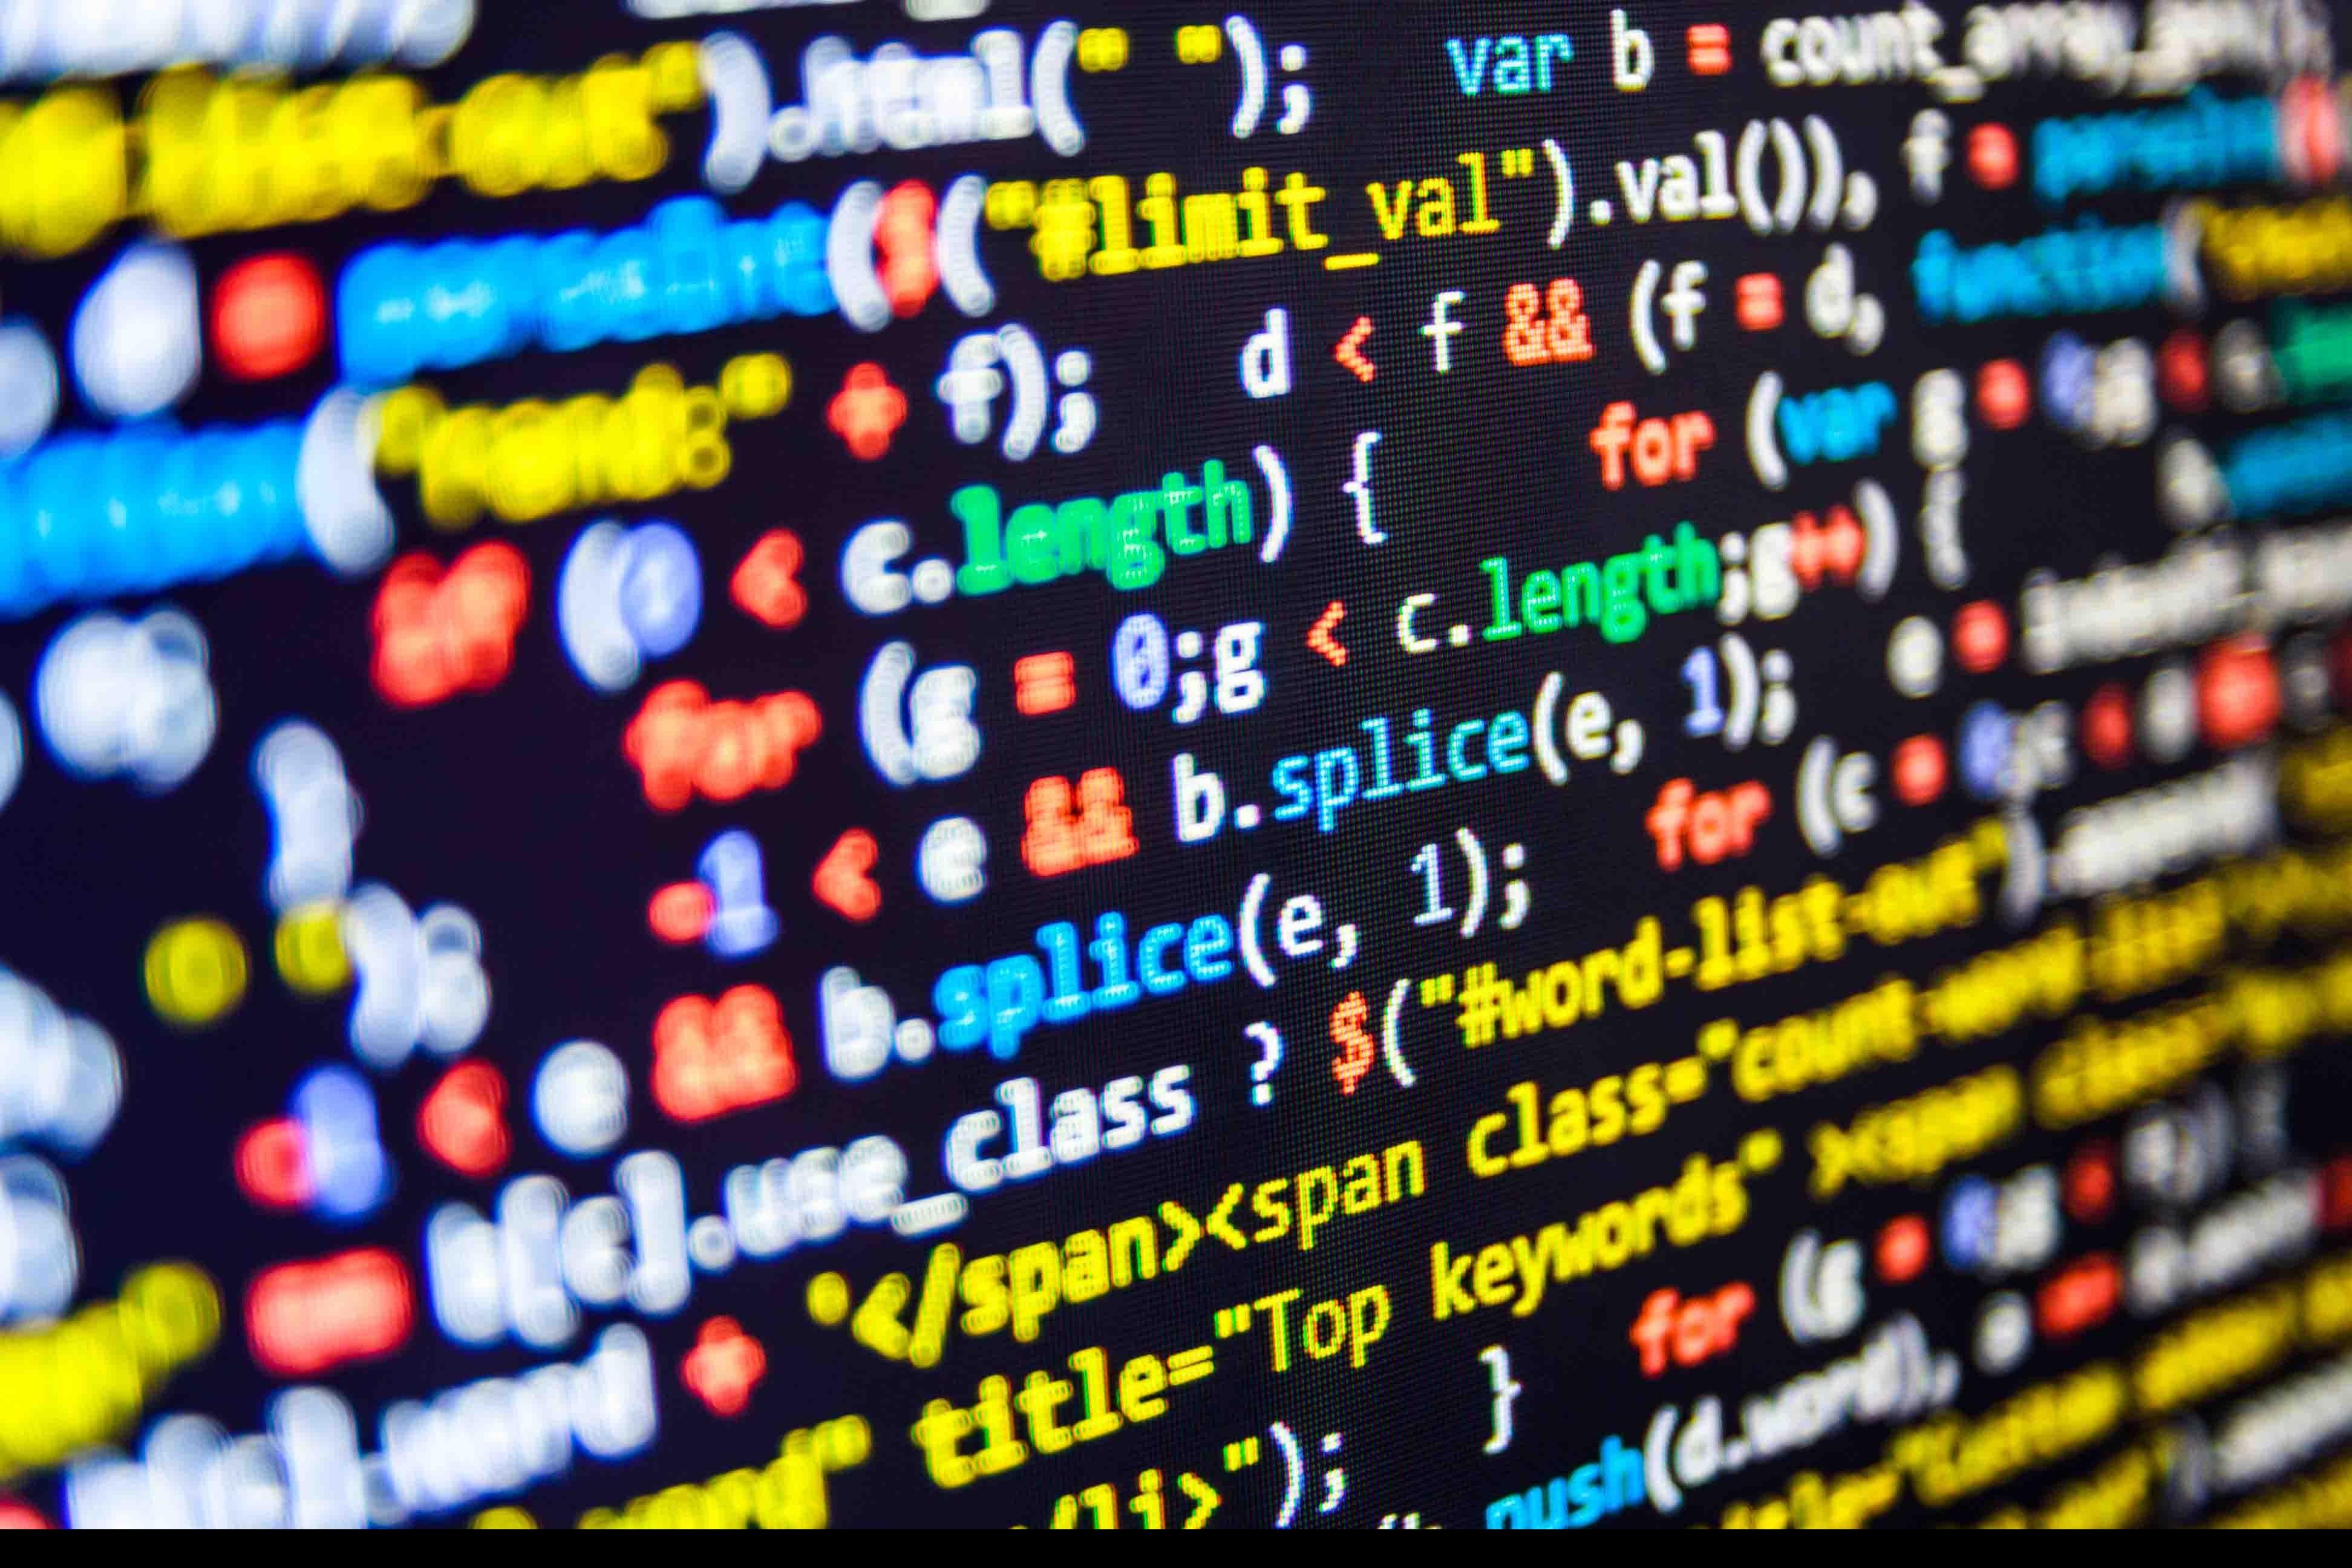 Text Code Programming HTML Web Development Pixels JavaScript Computer Screen PHP Syntax Highlighting Language 3888x2592